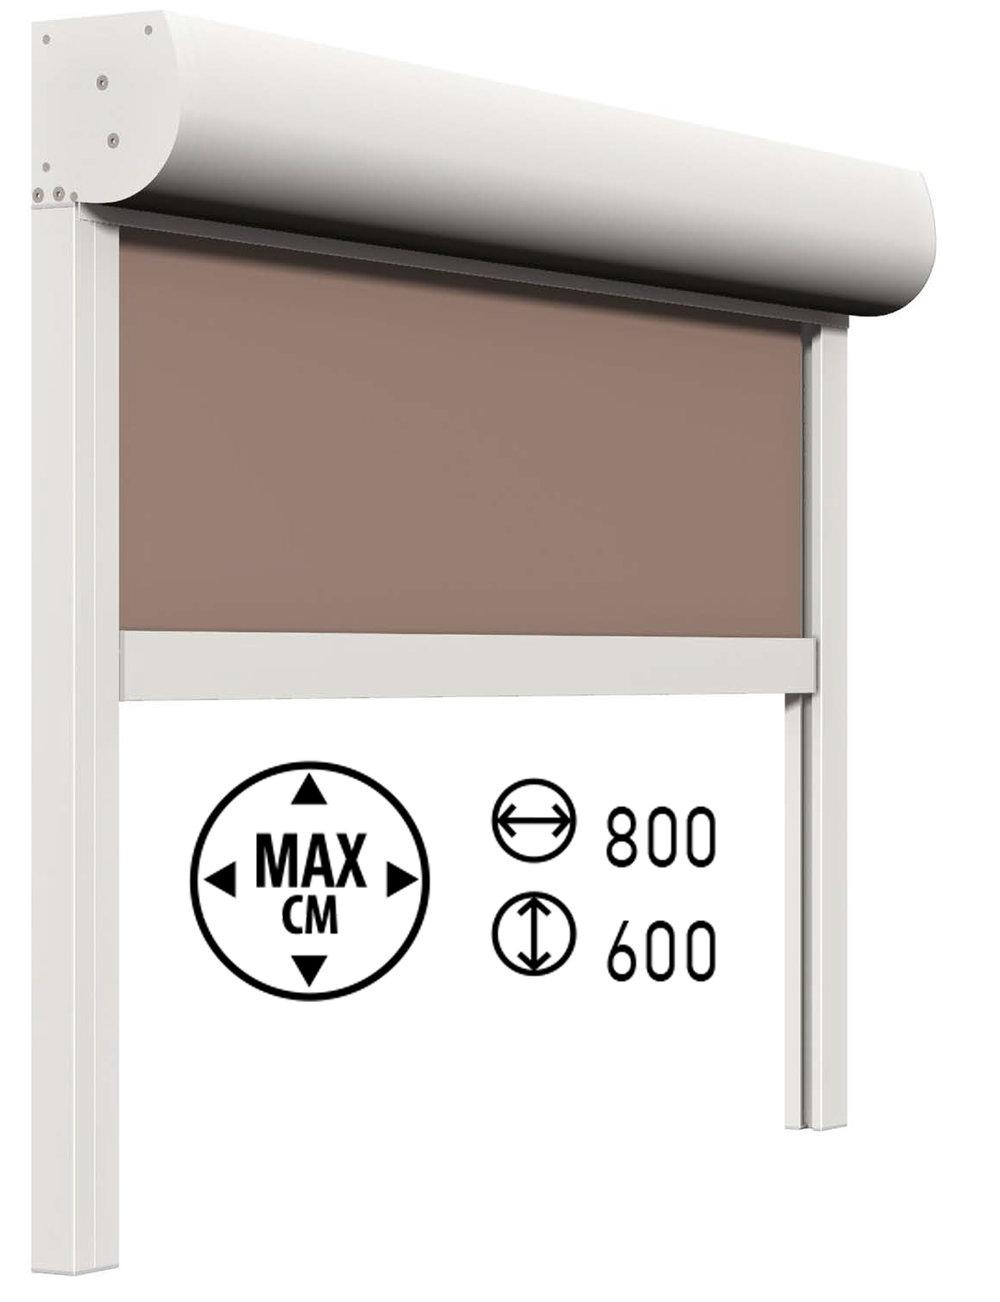 150-GPR-UNICA